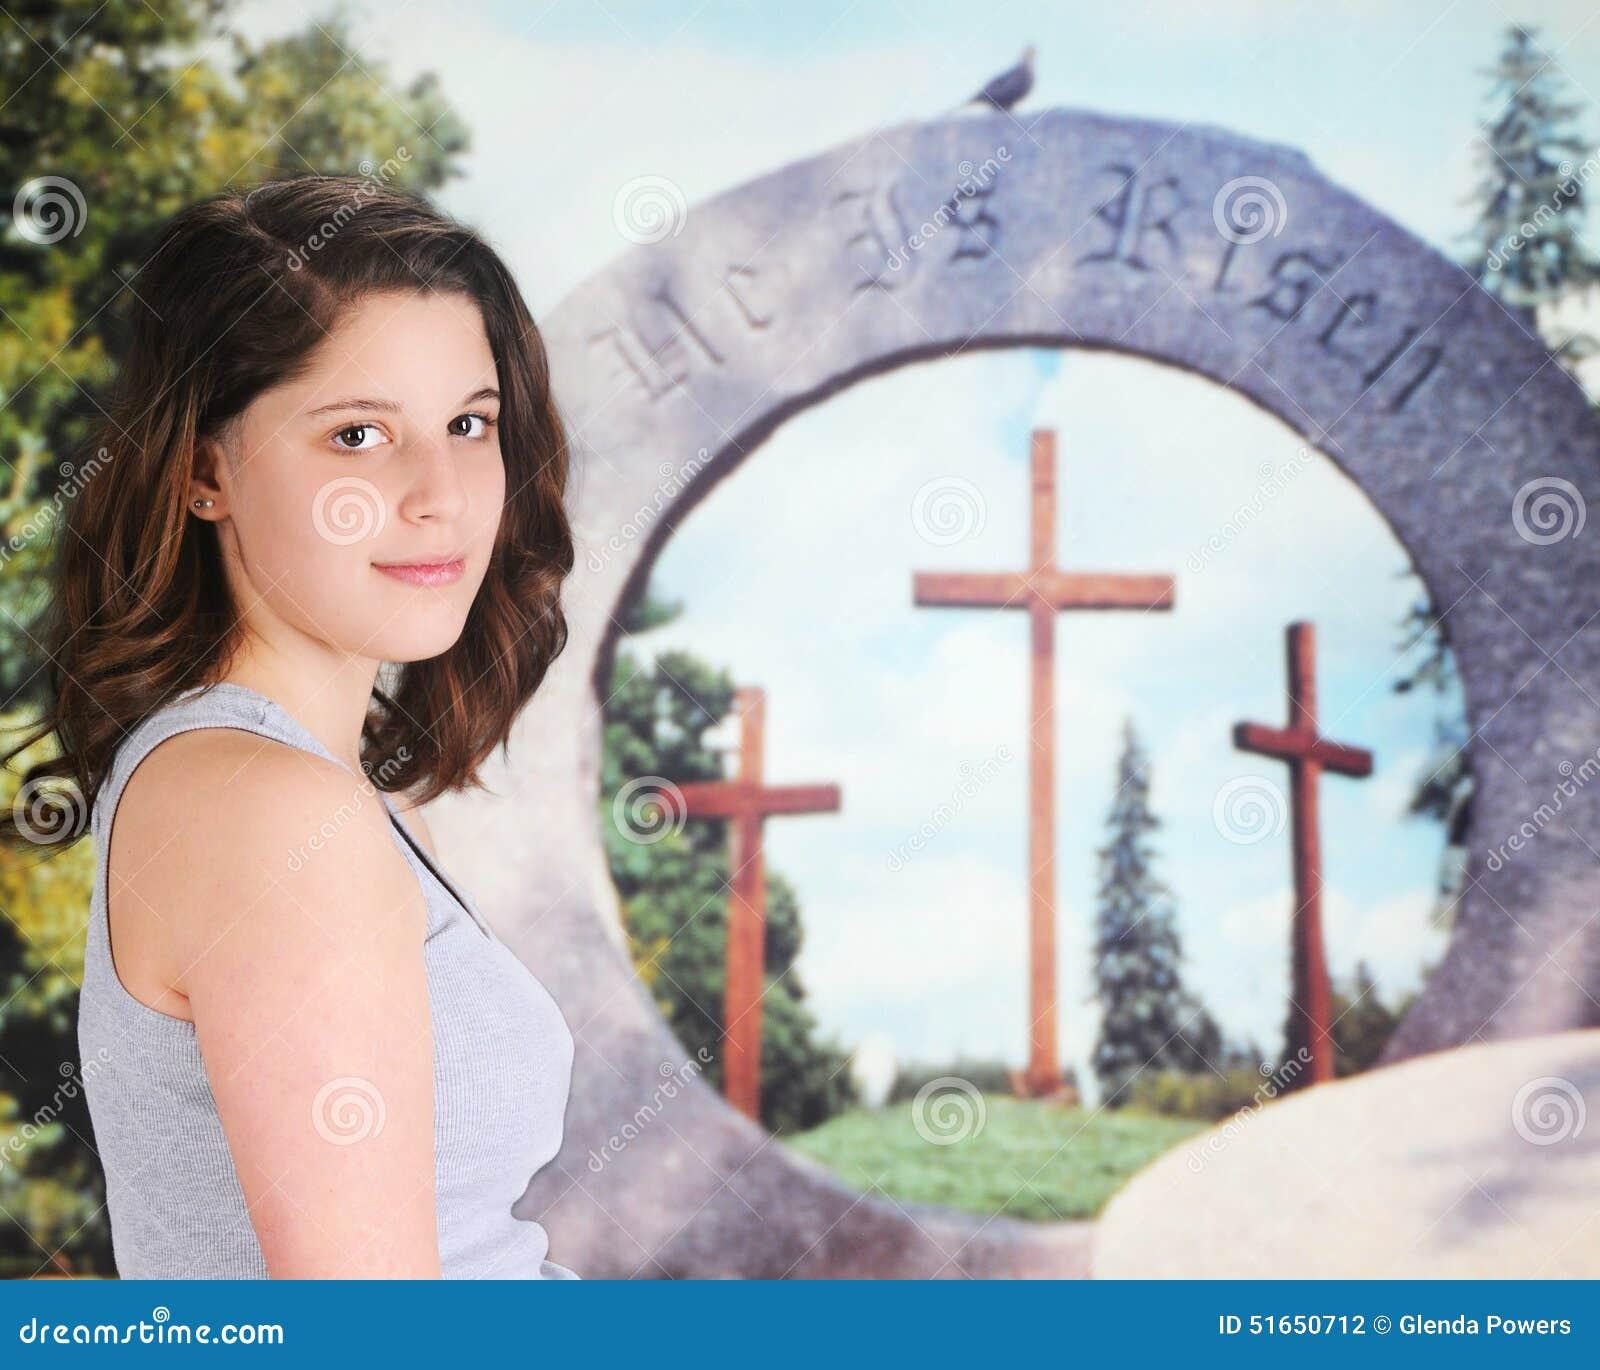 Teen christian easter readings women teen girls